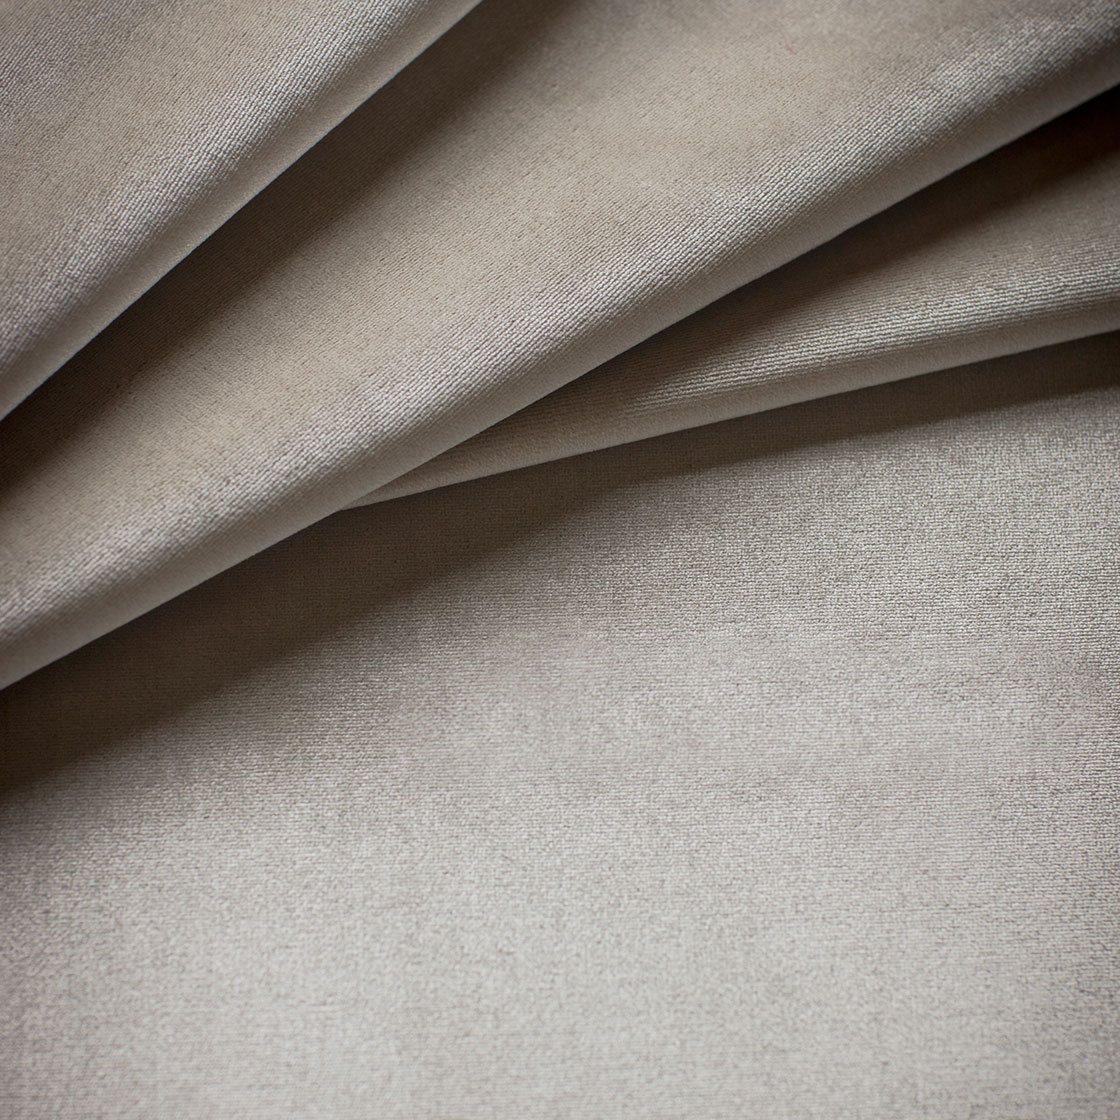 Capri Silk Velvet - Vanilla - Beaumont & Fletcher - Beaumont & Fletcher